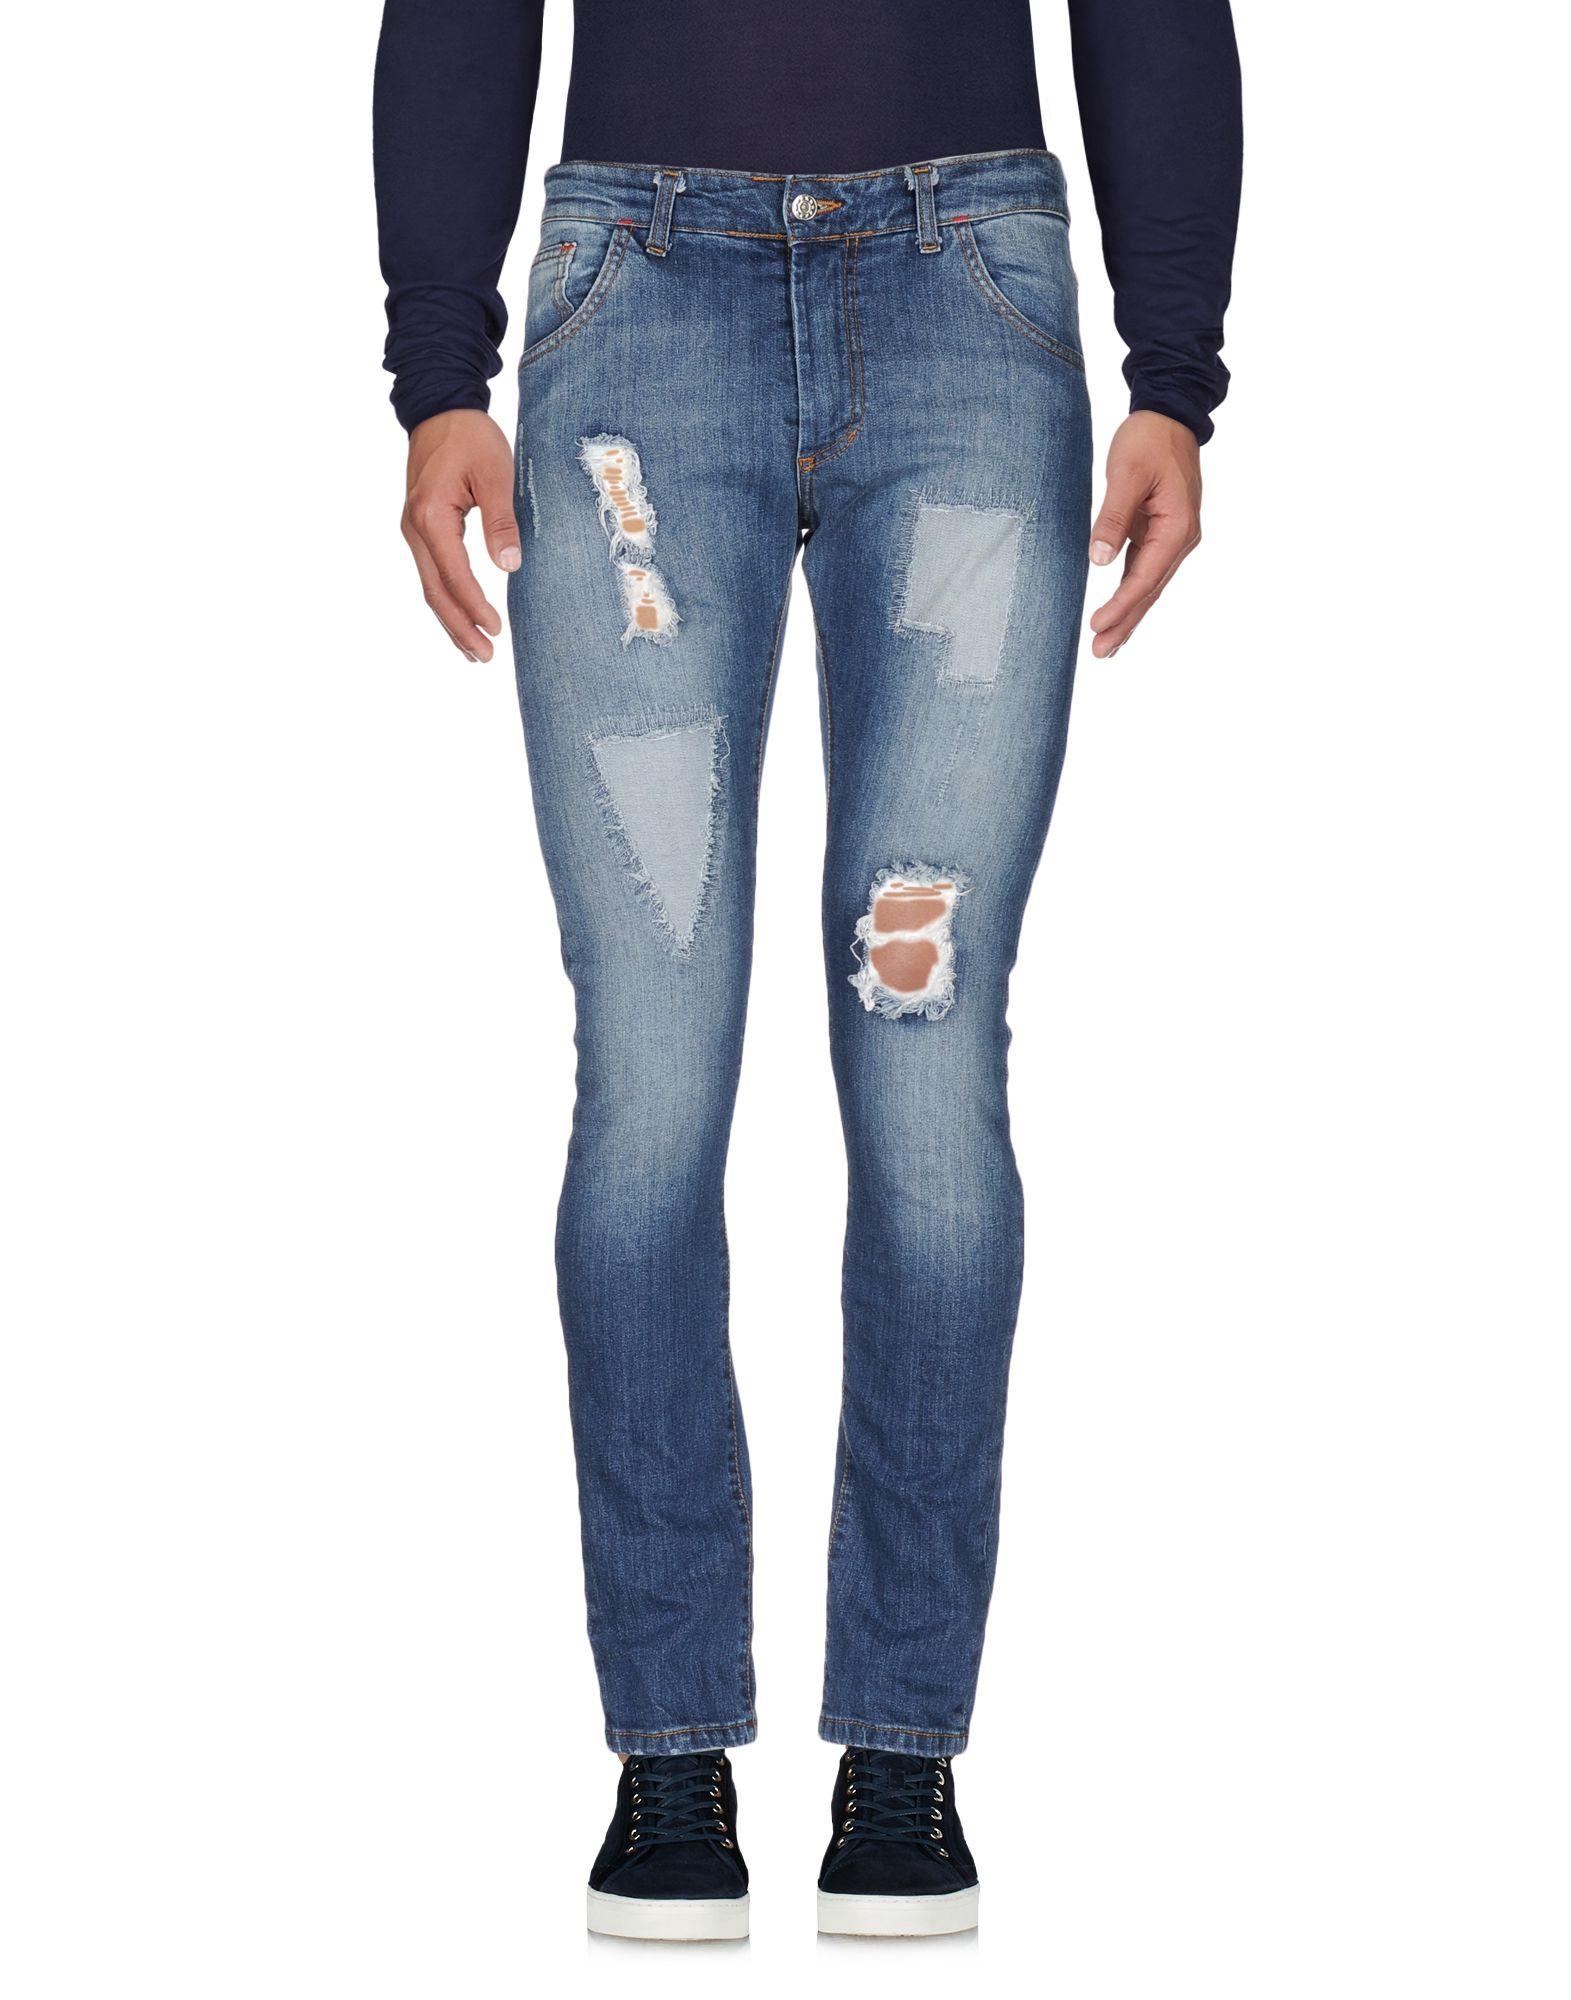 RAW SUGAR Jeans